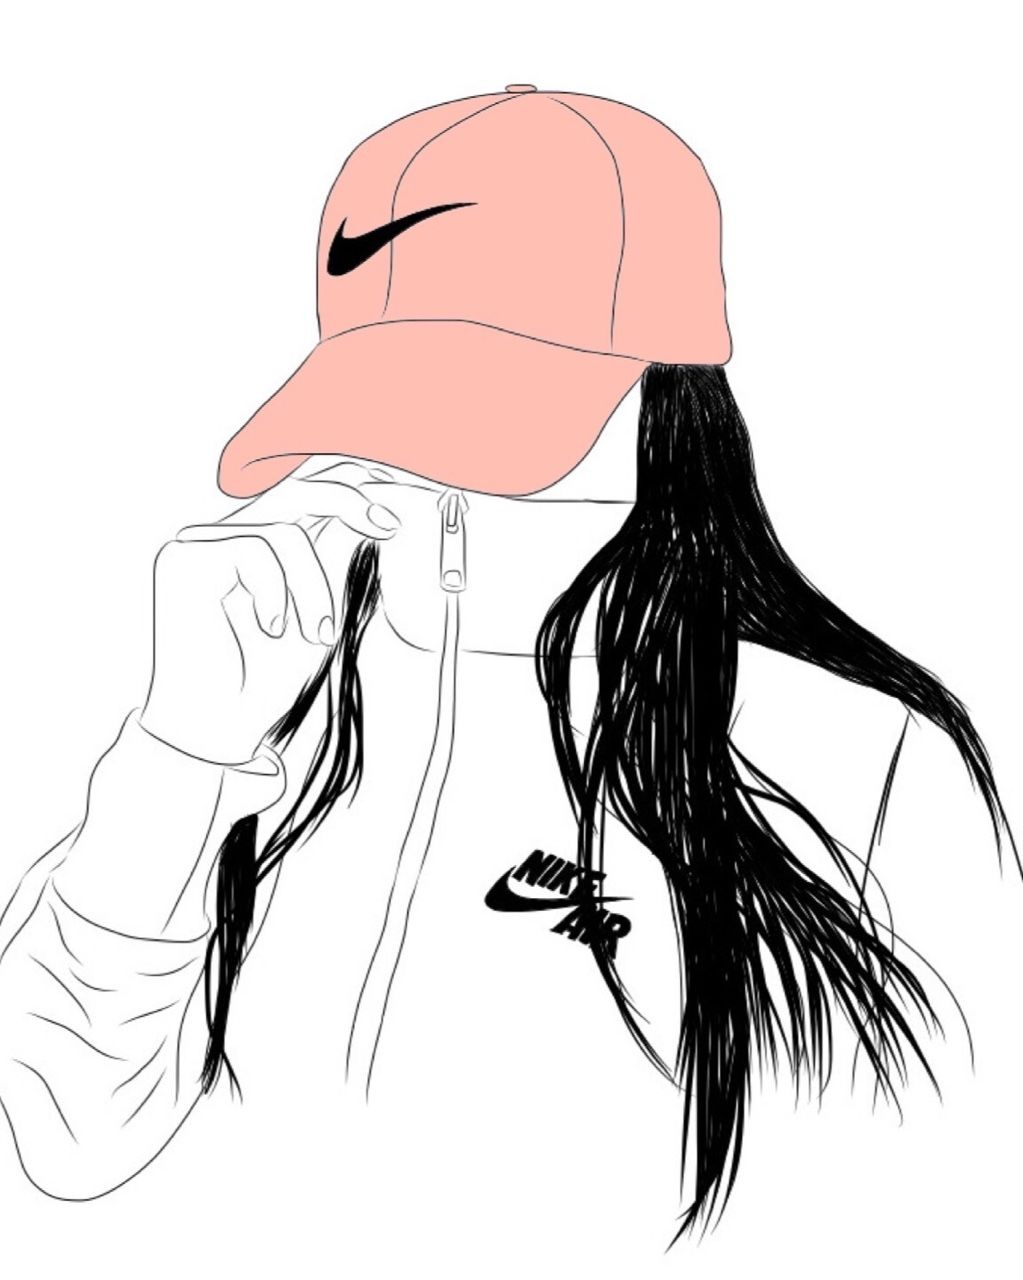 Outline Art, Outline Drawings, Girl Drawings, Drawing Girls, Outline  Images, Drawing Art, Drawing Ideas, Girl Outlines, Dope Art